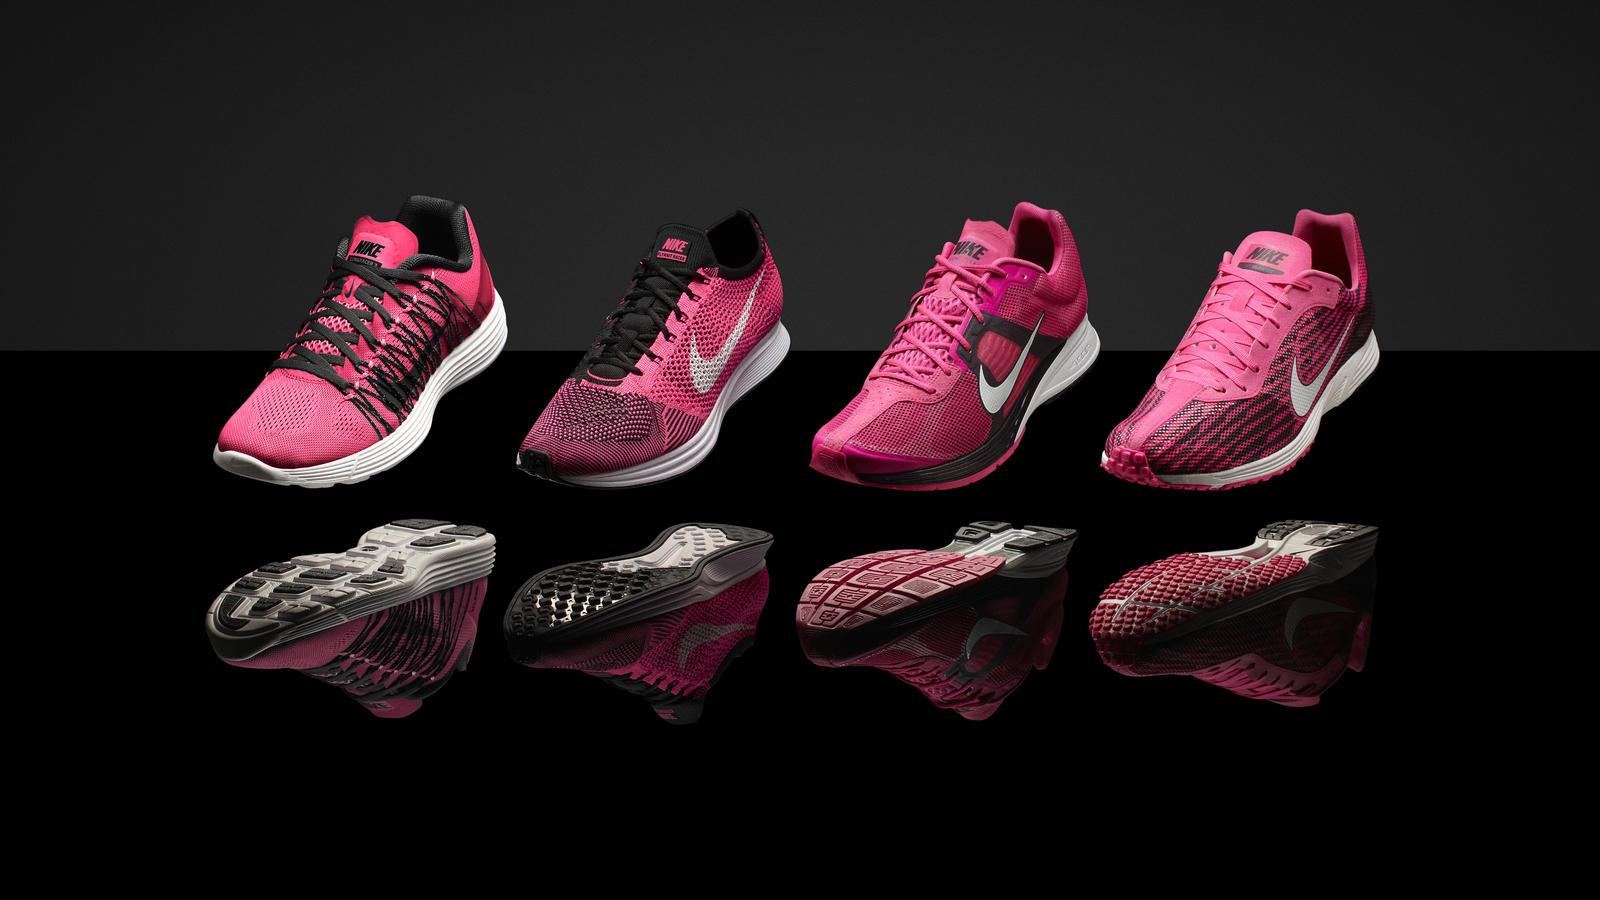 pinkfoil_nike_marathon_group